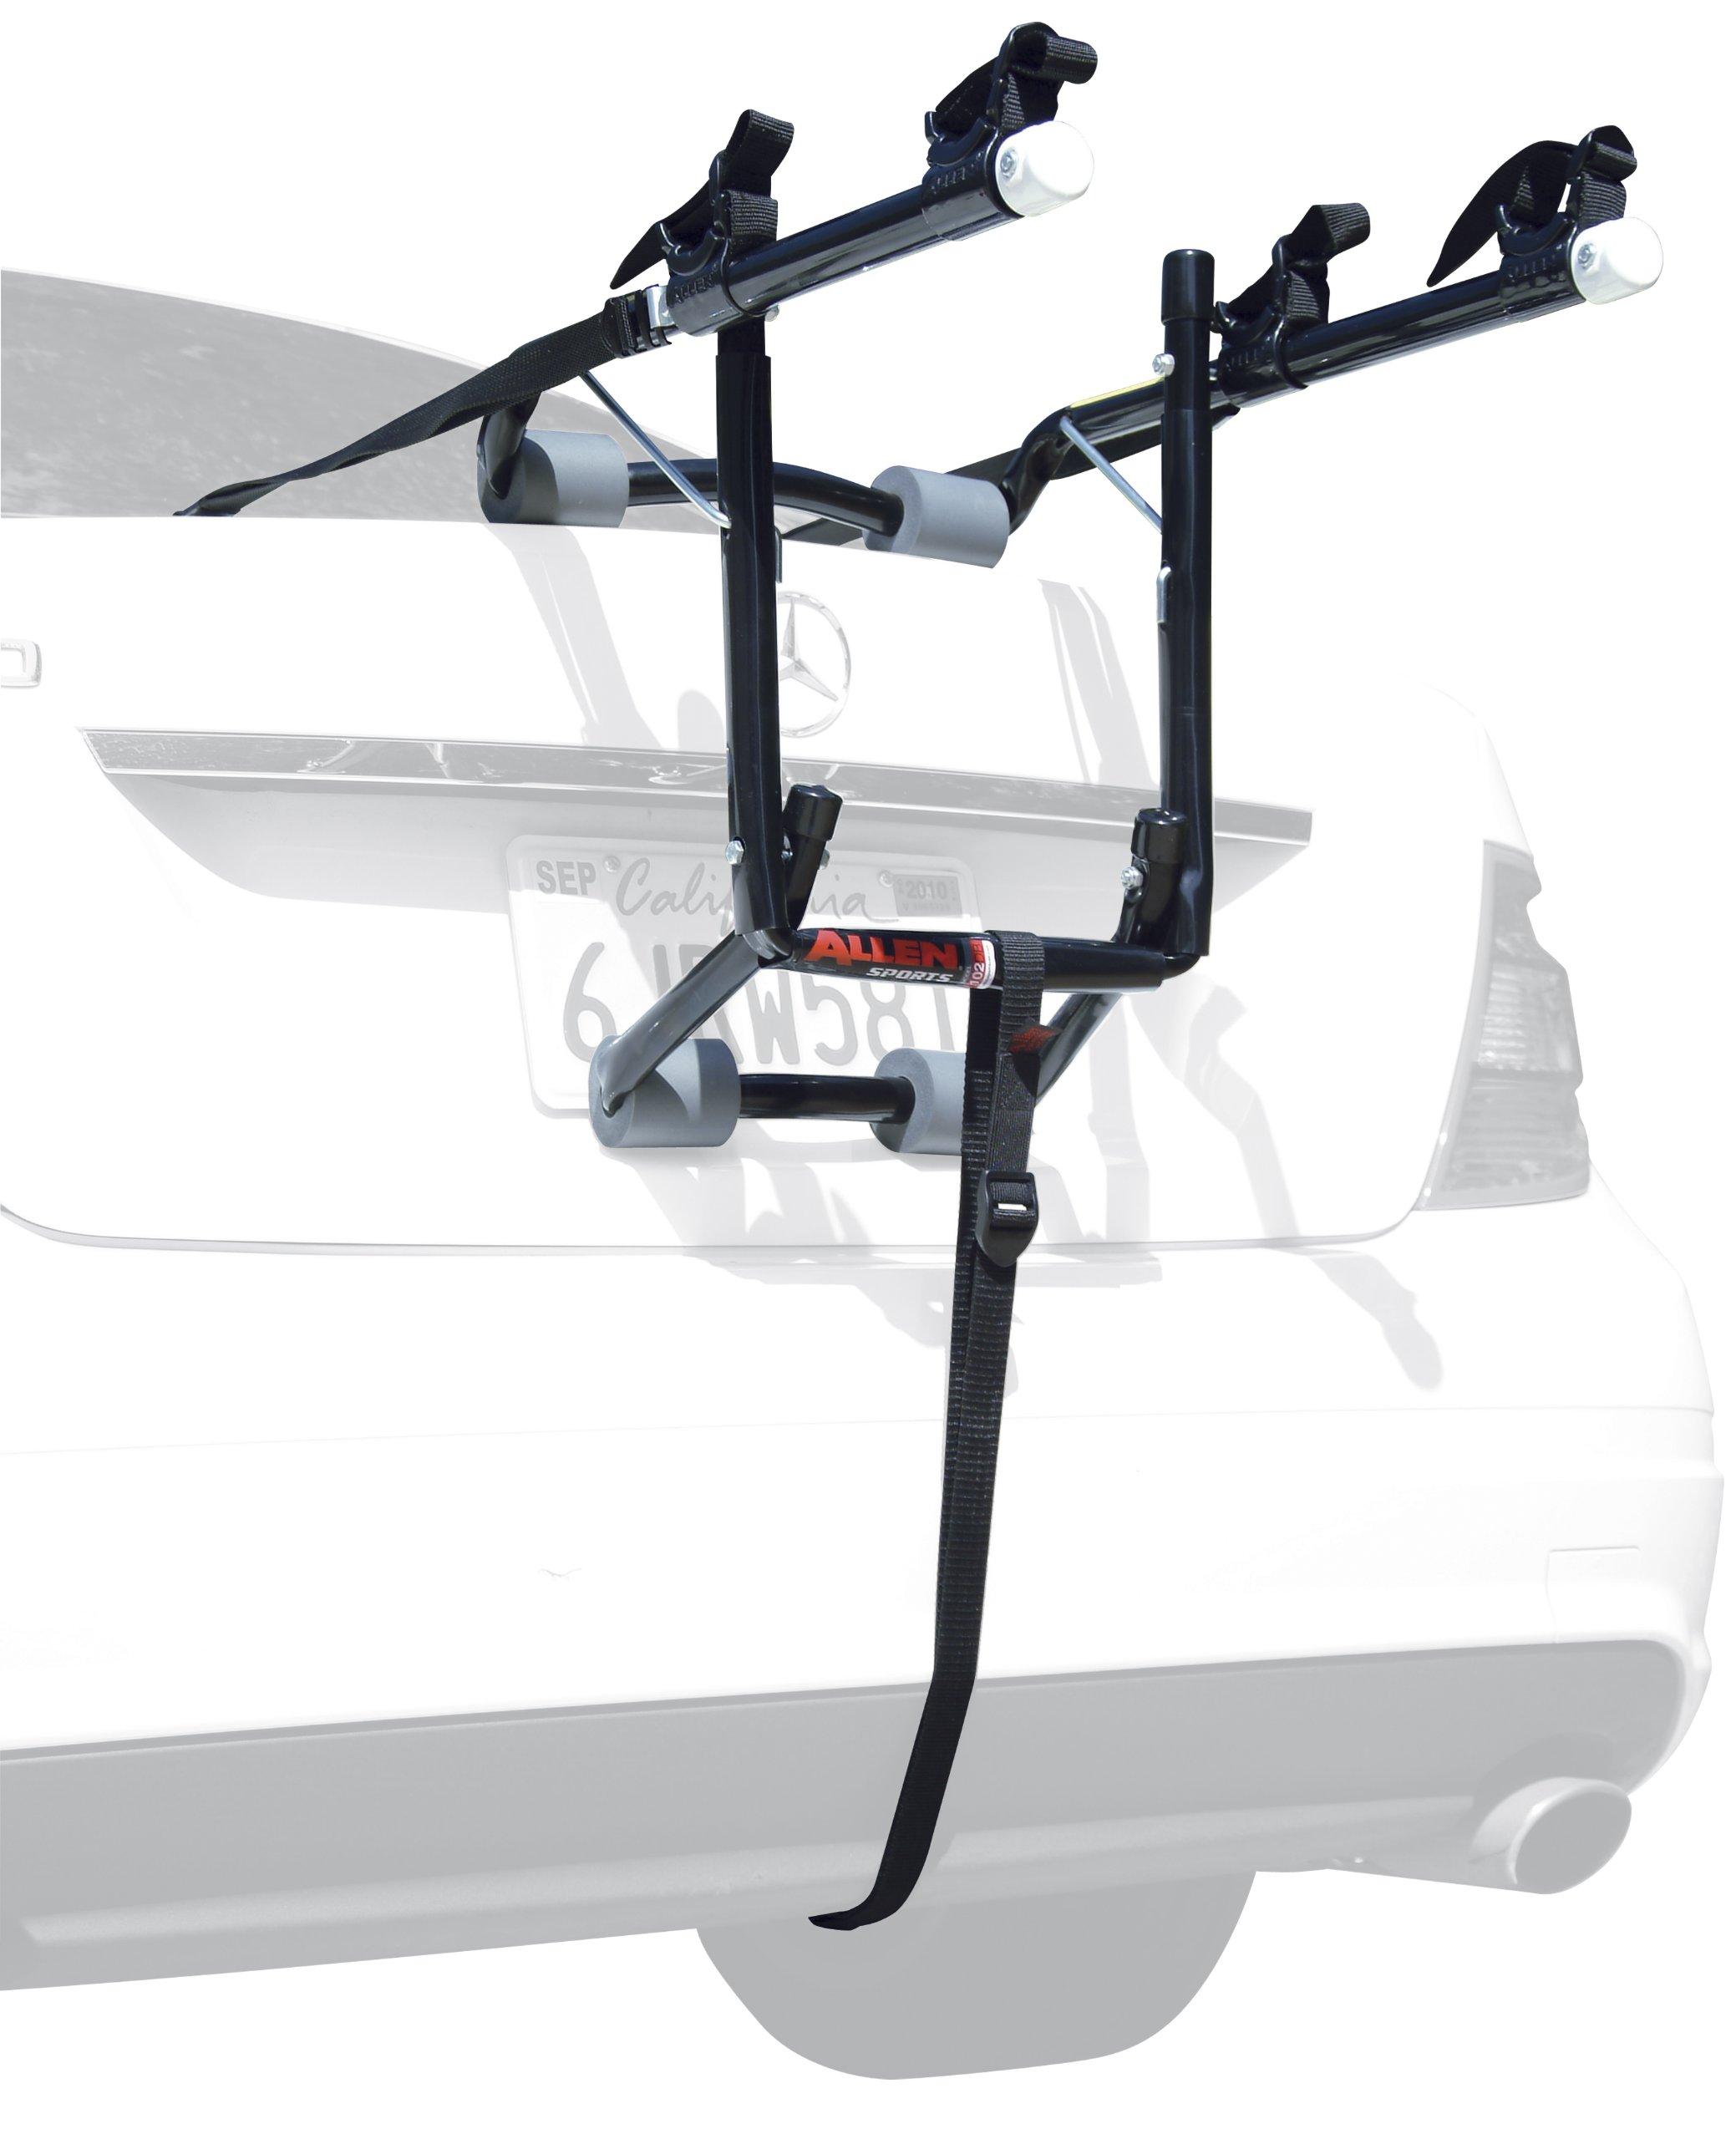 Allen Sports Deluxe 2-Bike Trunk Mount Rack